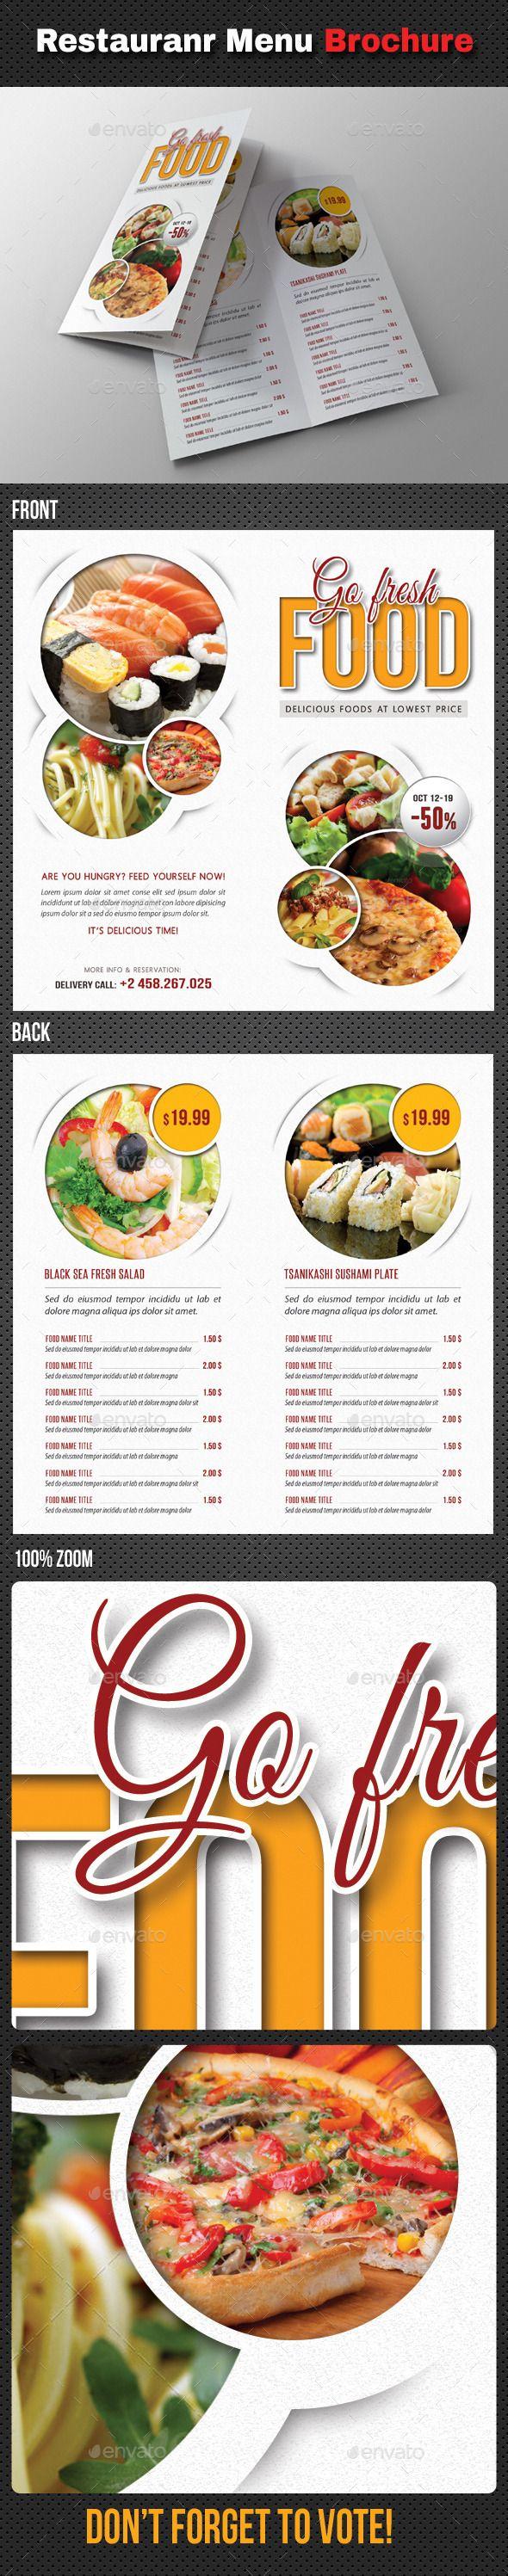 Go Fresh Restaurant Menu Bifold Brochure Template #design Download: http://graphicriver.net/item/go-fresh-restaurant-menu-bifold-brochure/13009023?ref=ksioks